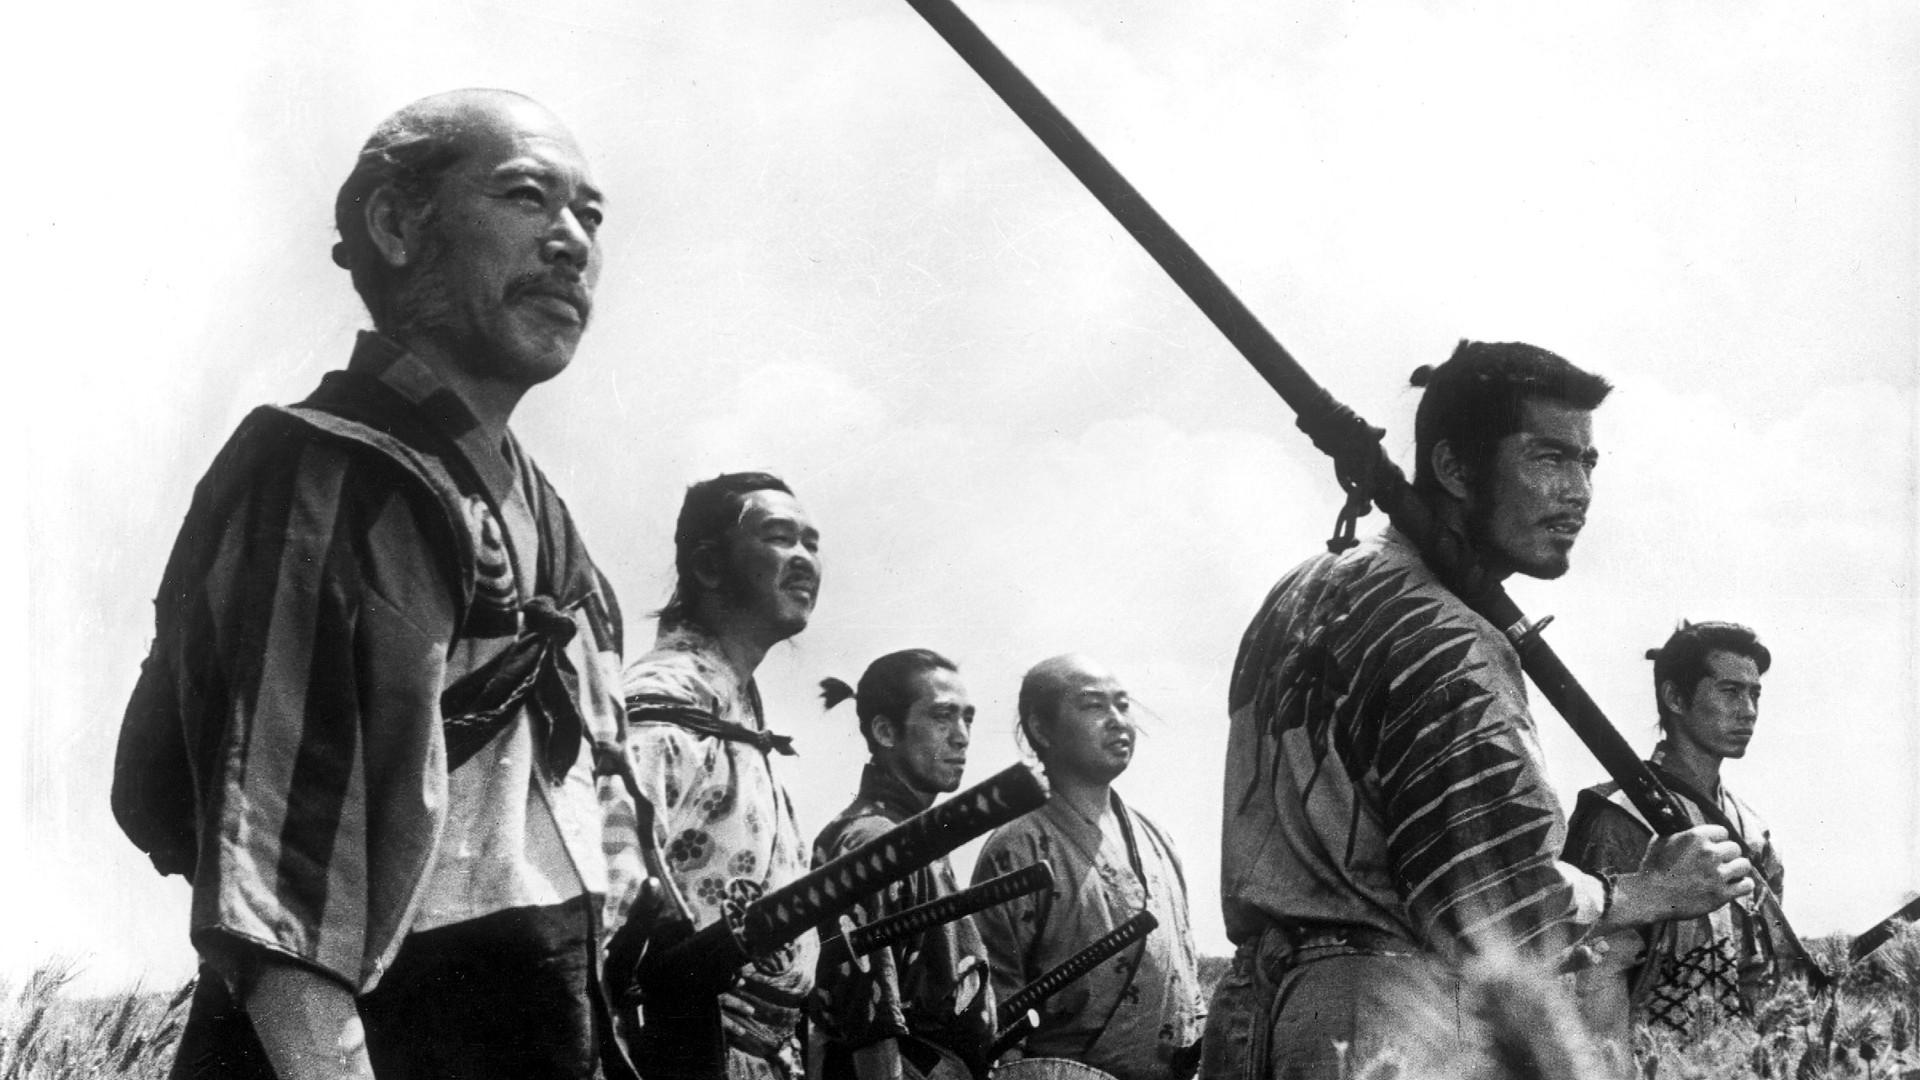 General 1920x1080 movies Akira Kurosawa monochrome movie scenes samurai film stills